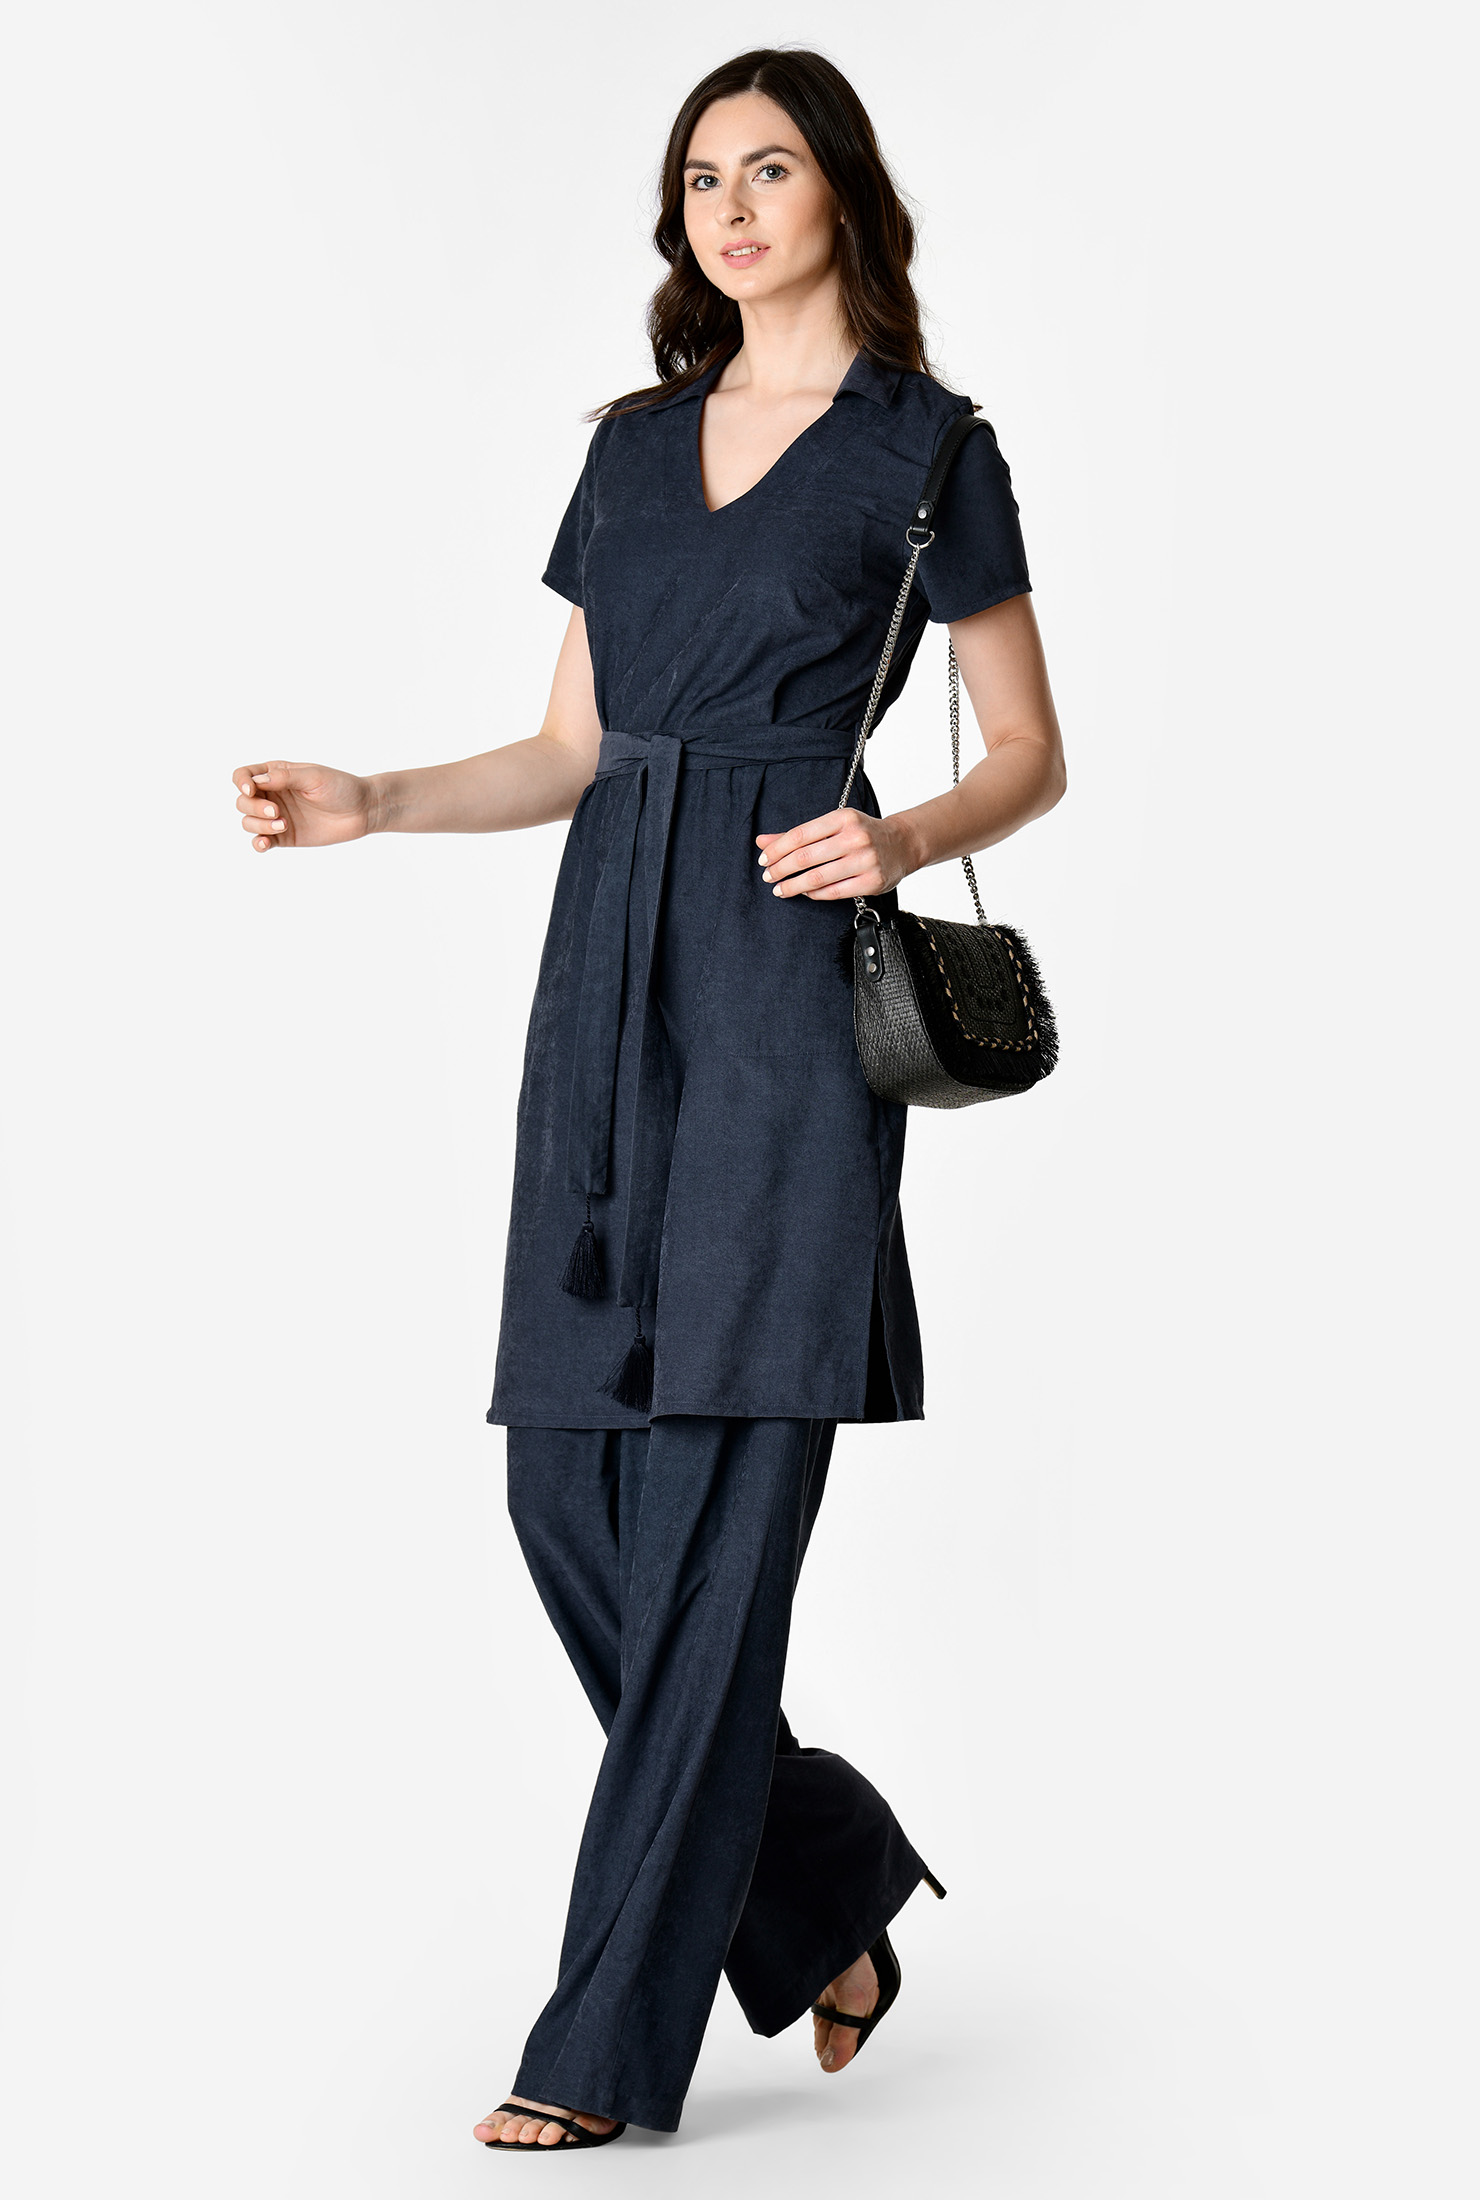 70s Dresses – Disco Dresses, Hippie Dresses, Wrap Dresses Sash tie twill tunic top and wide leg pants $69.95 AT vintagedancer.com